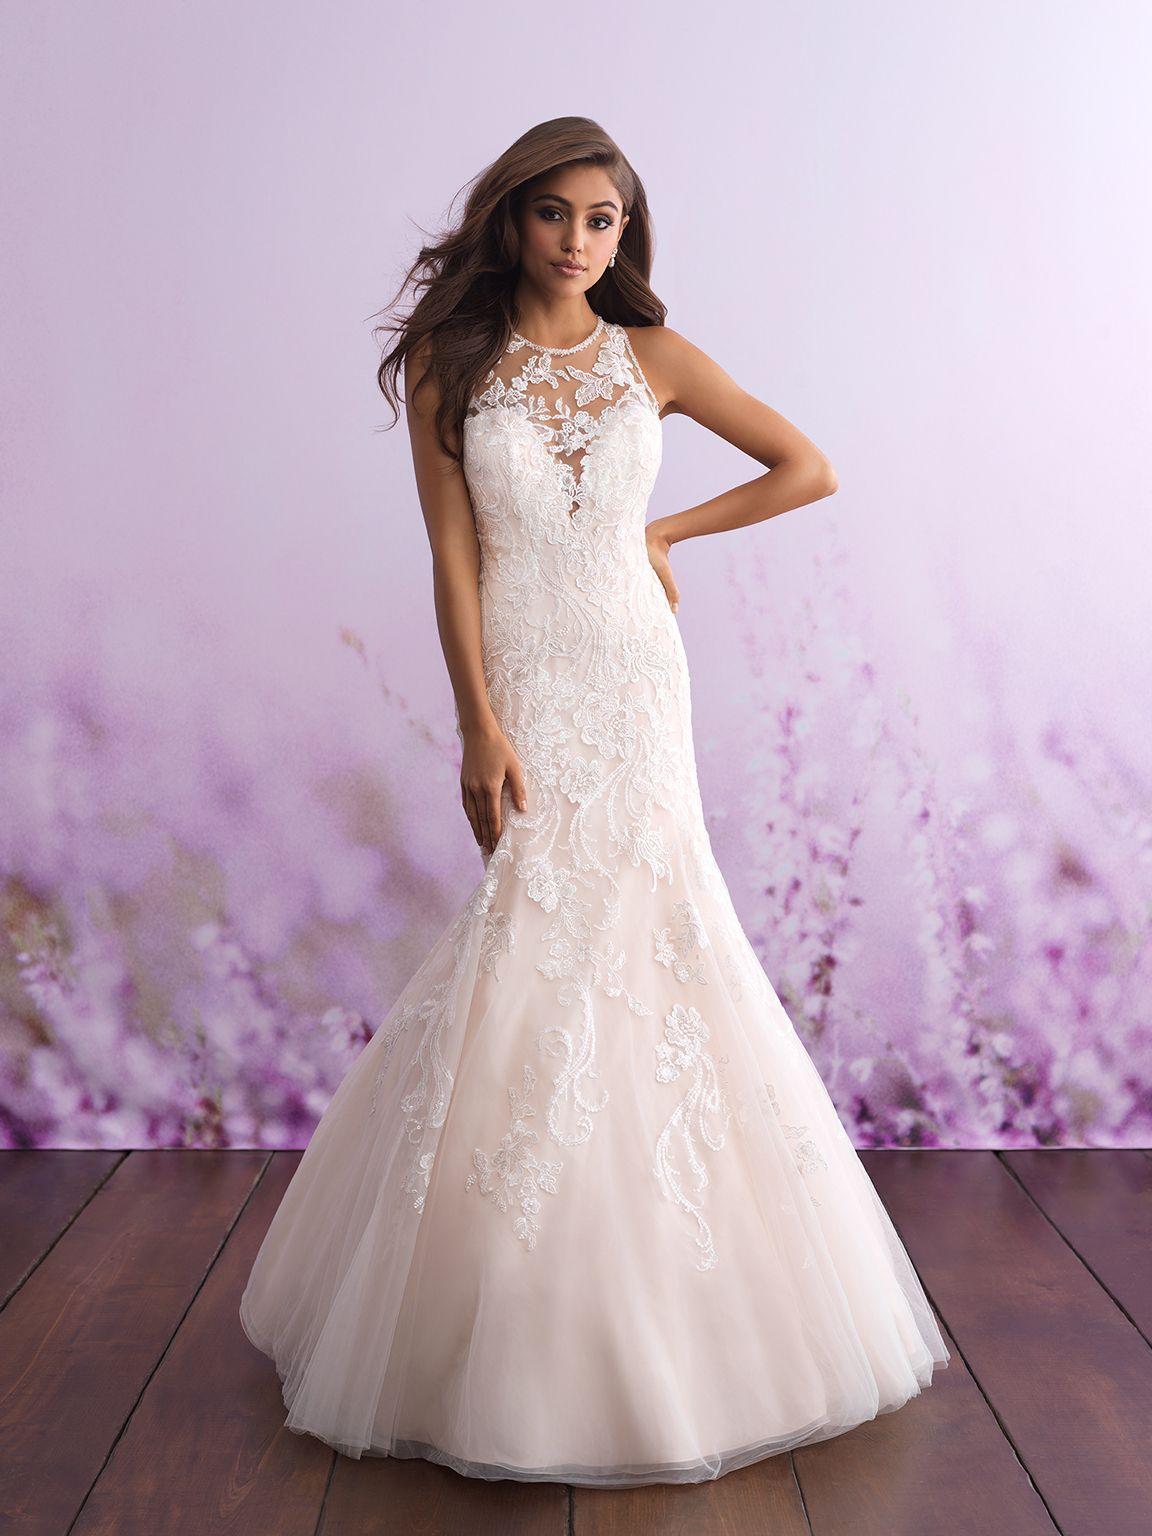 Thumbnail noivas pinterest allure romance allure bridal and